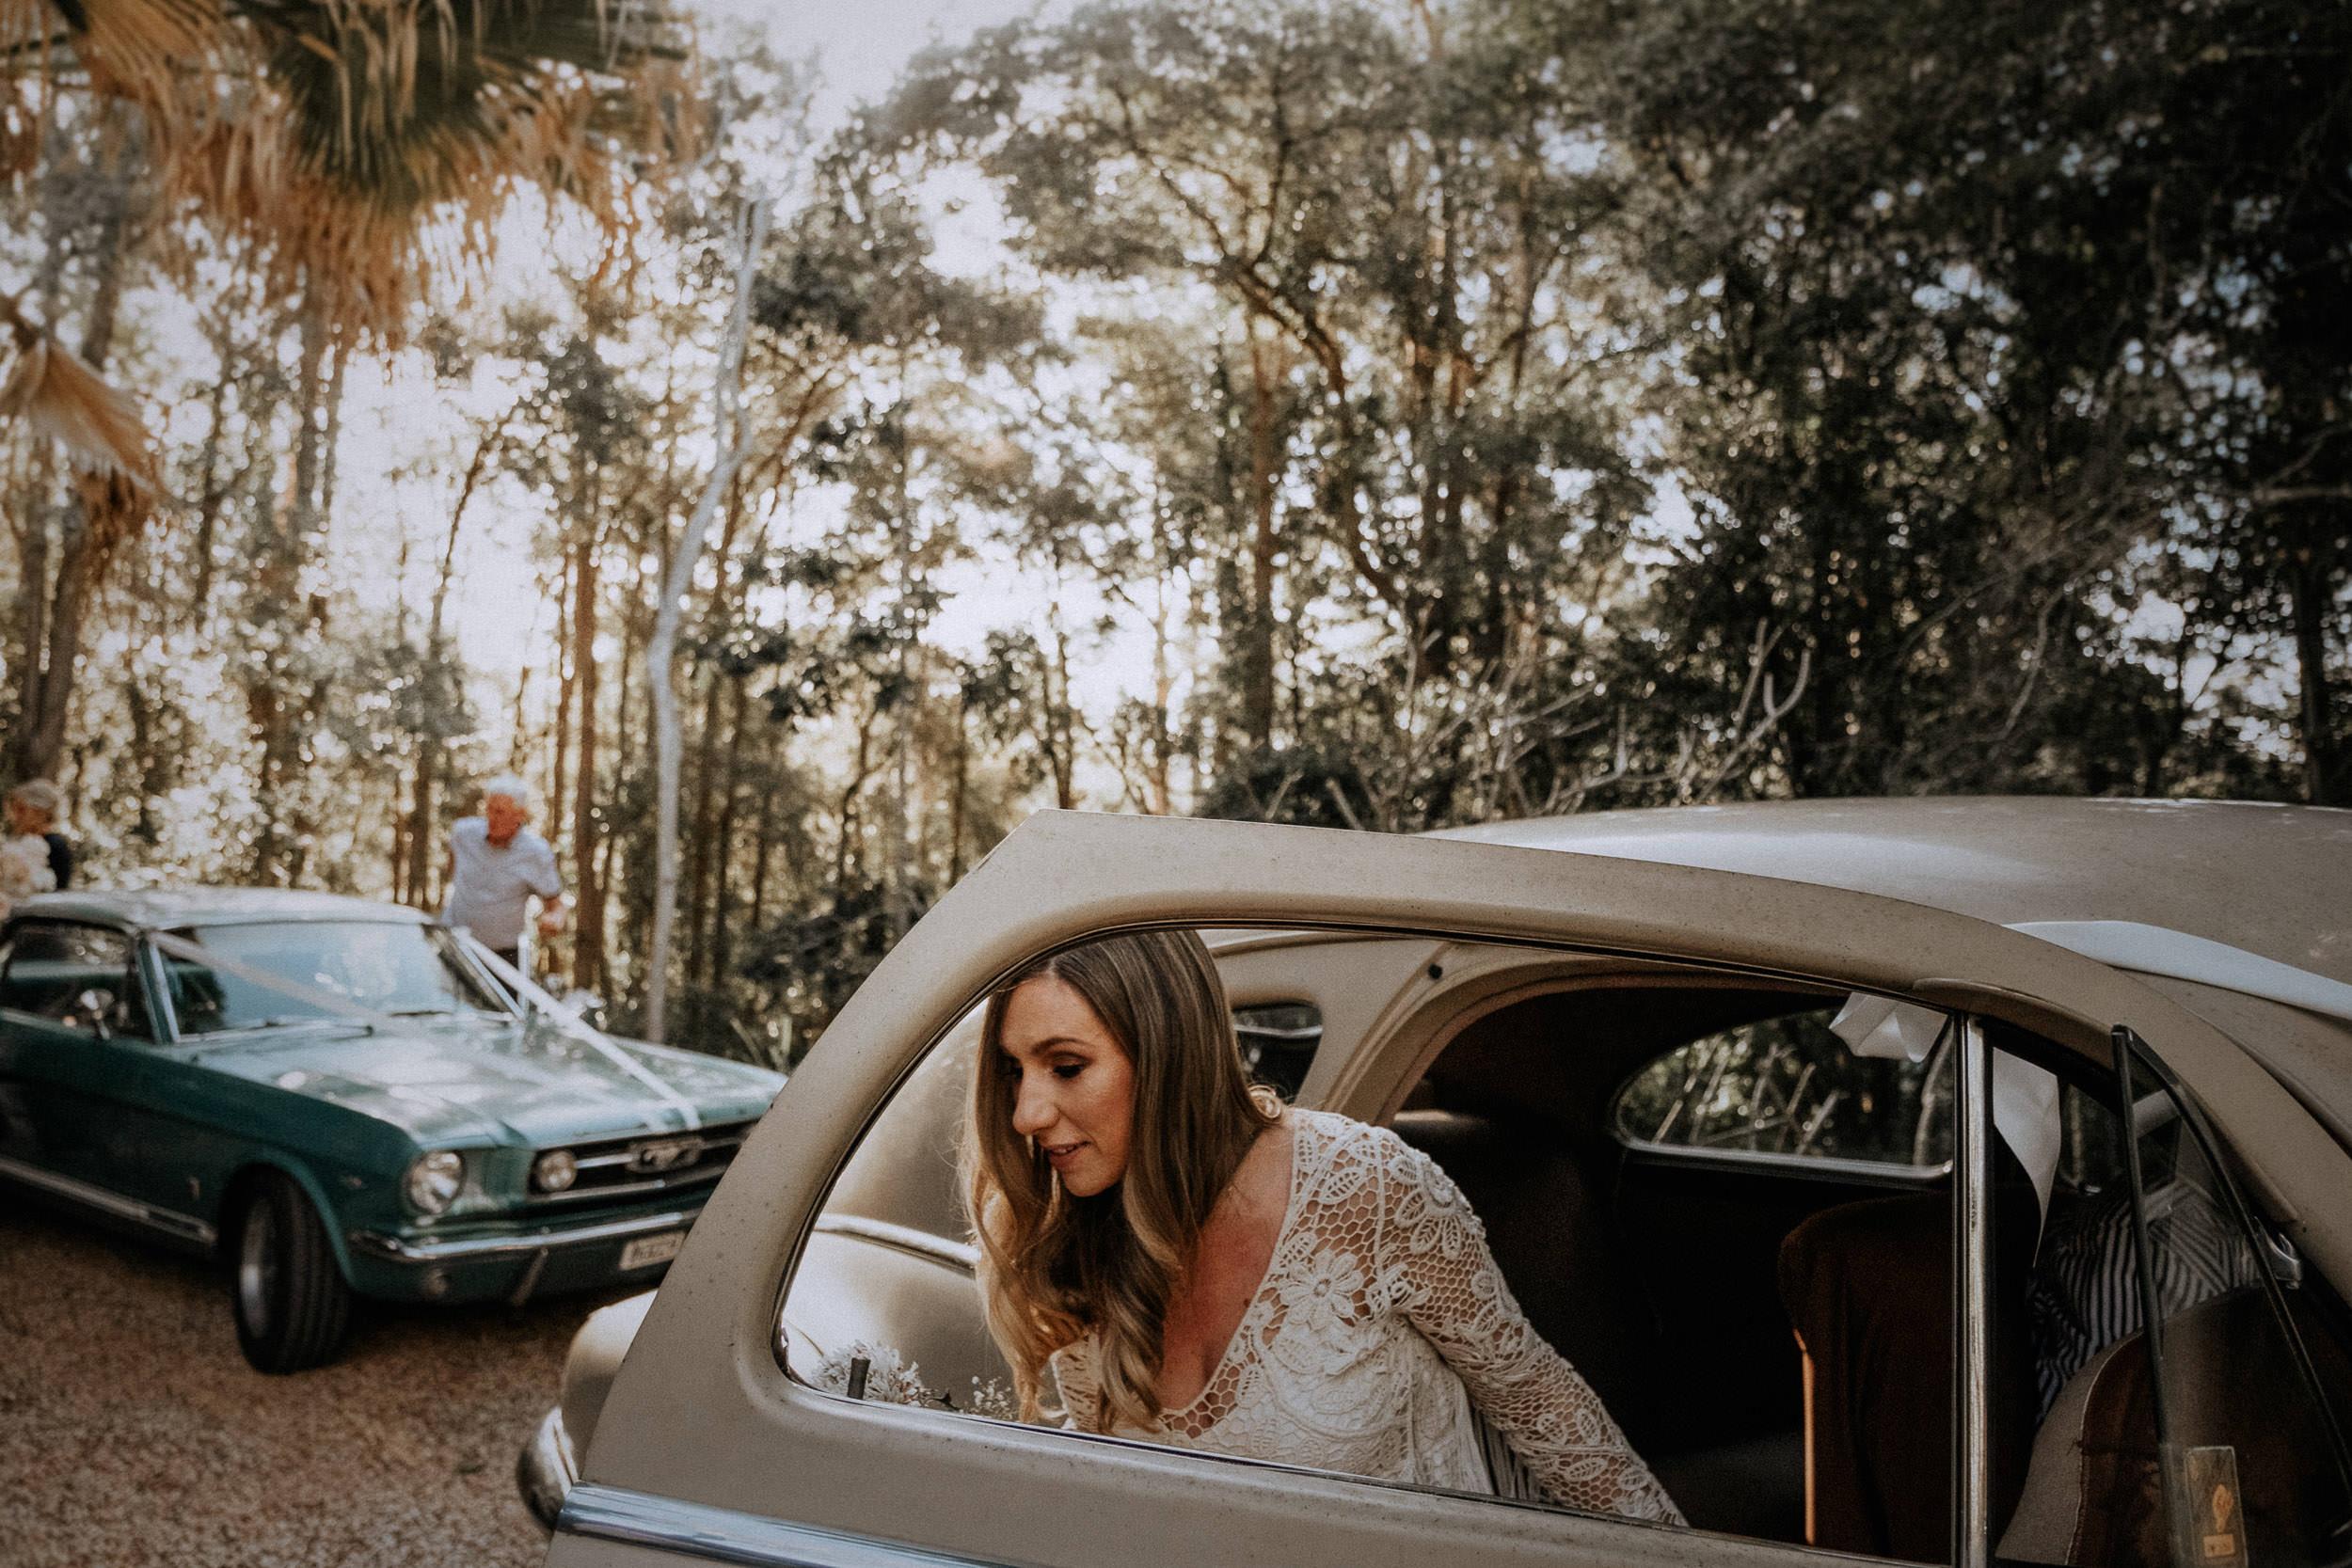 S&A Elopement - Kings & Thieves - Shred 'Til Dead - Central Coast Beach Forest Wedding - 146.jpg